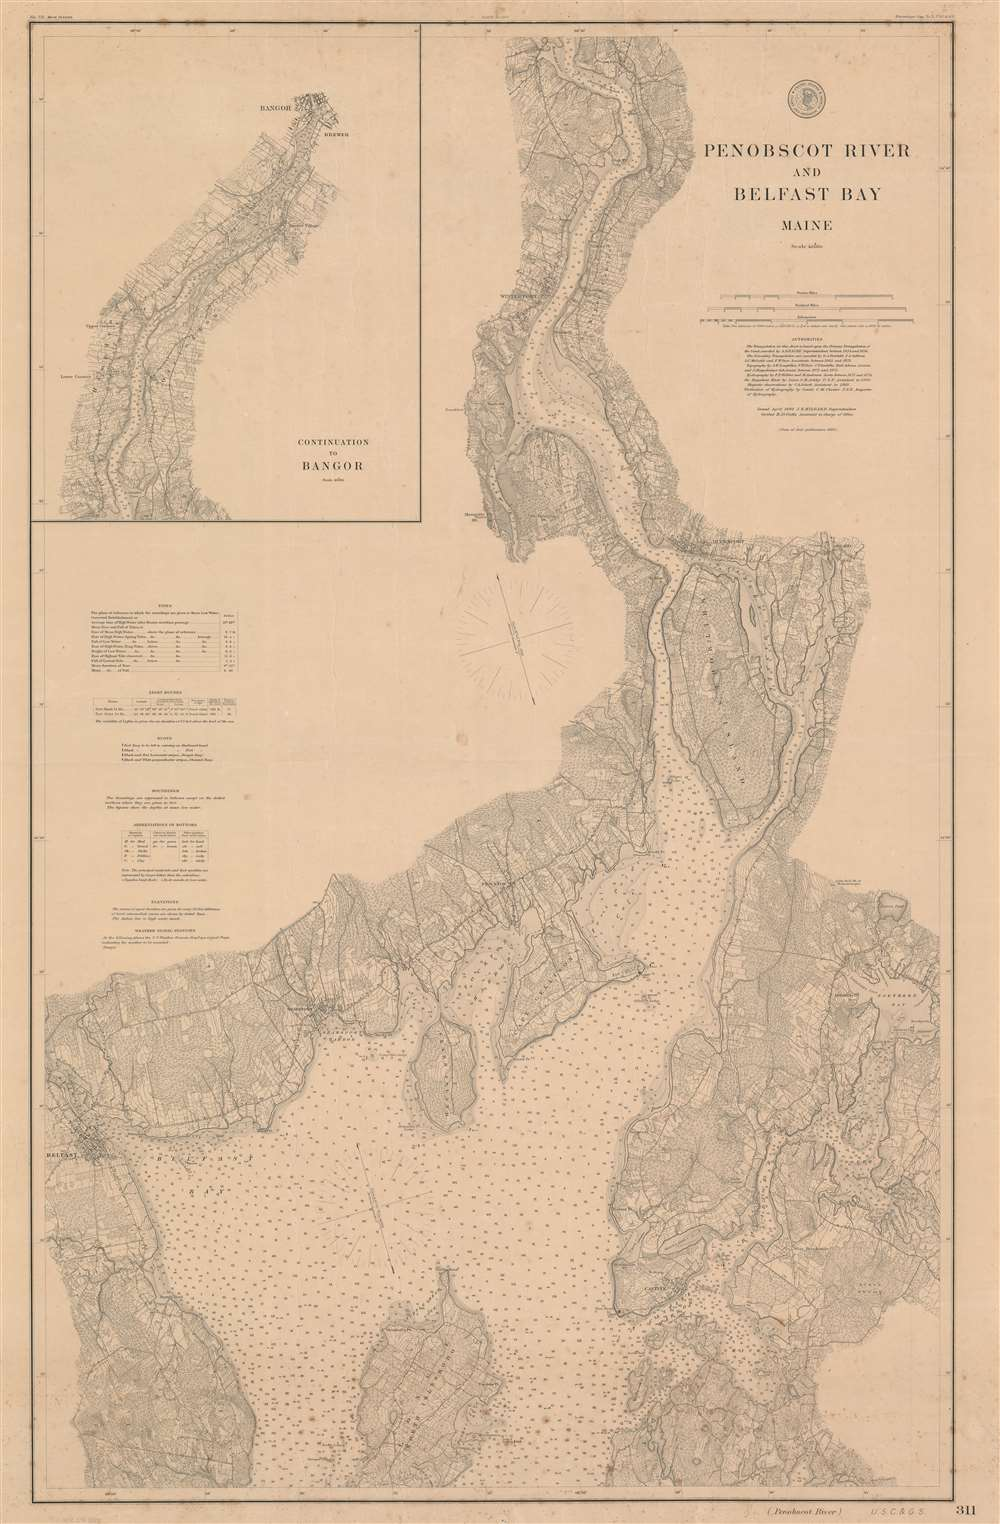 Penobscot River and Belfast Bay Maine.